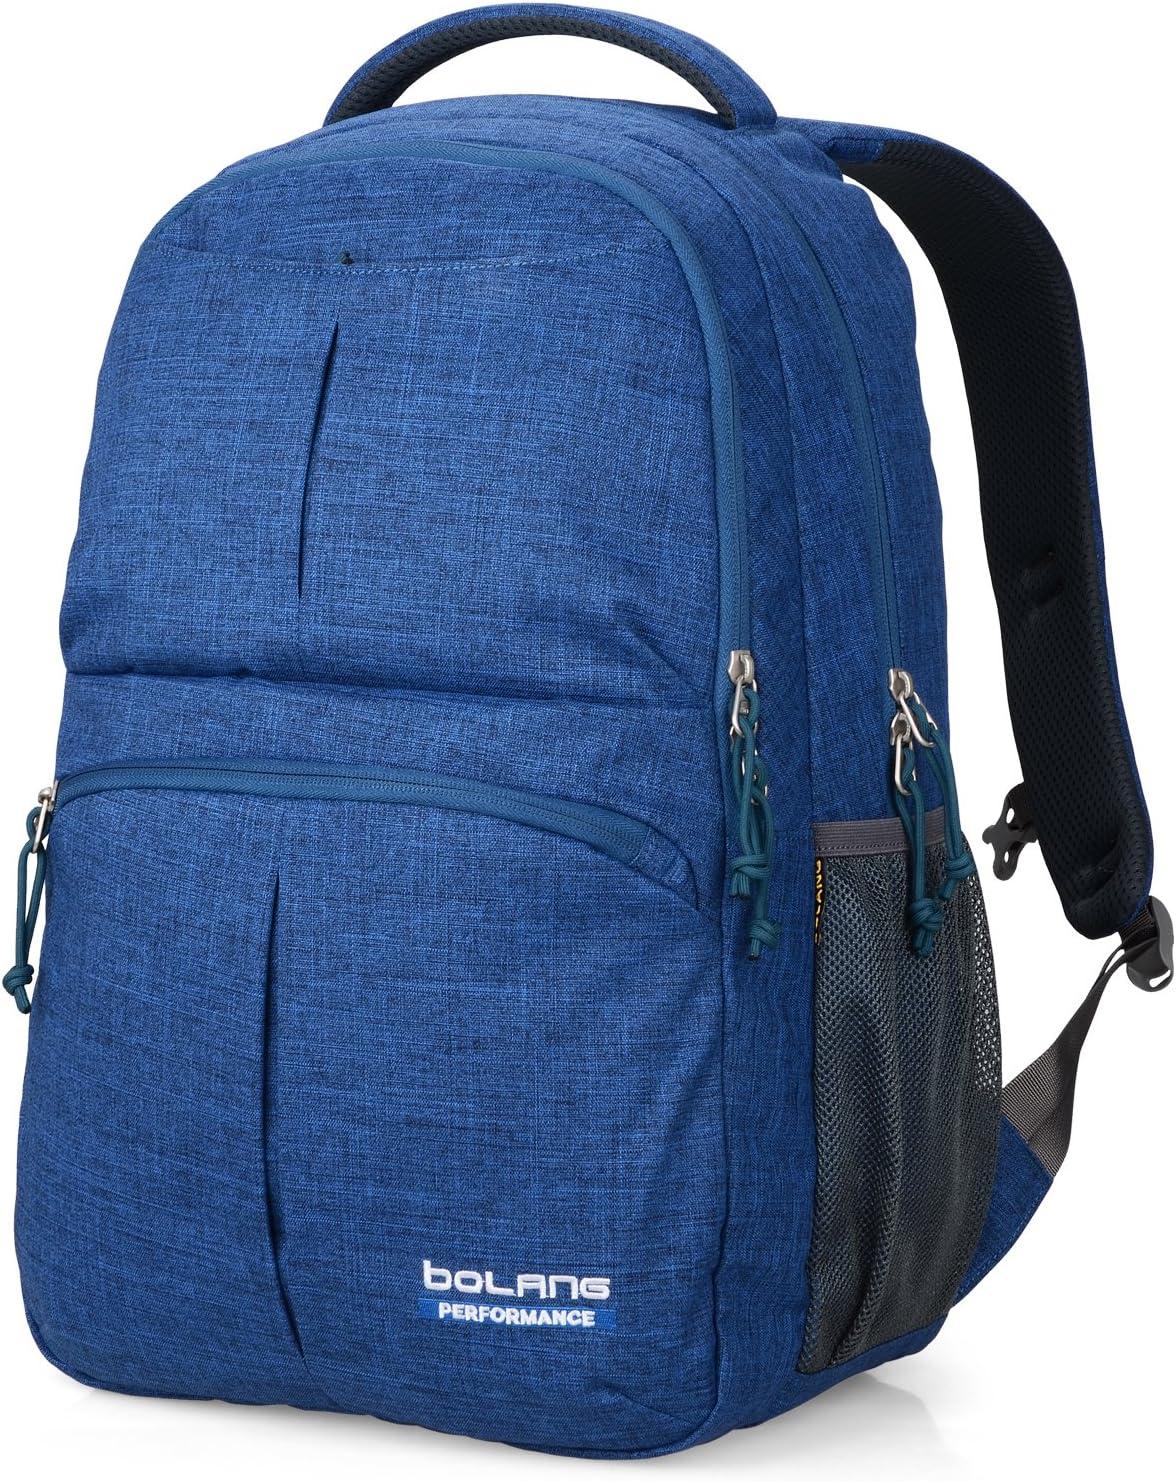 BOLANG College Backpack for Men